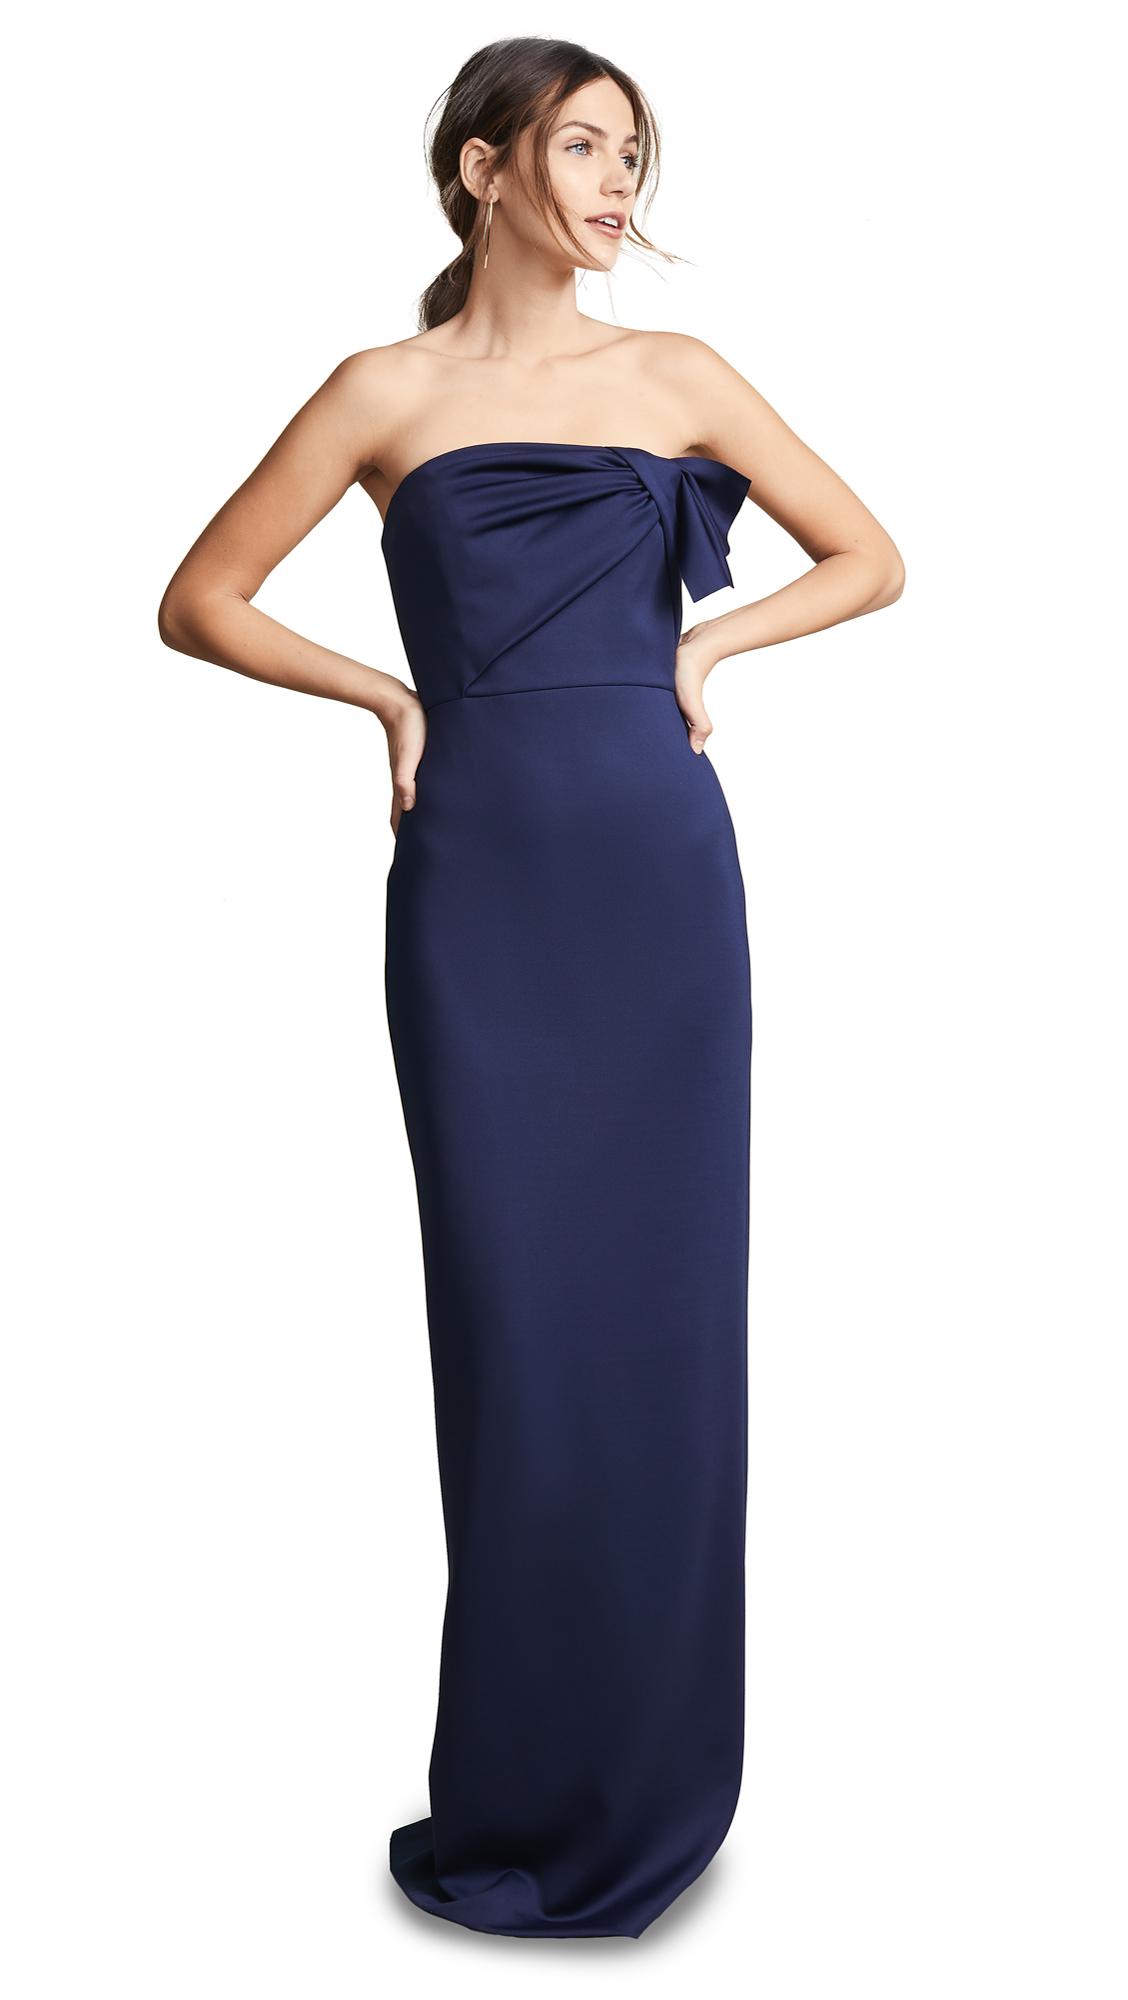 Black Halo Divina Gown - Pacific Blue